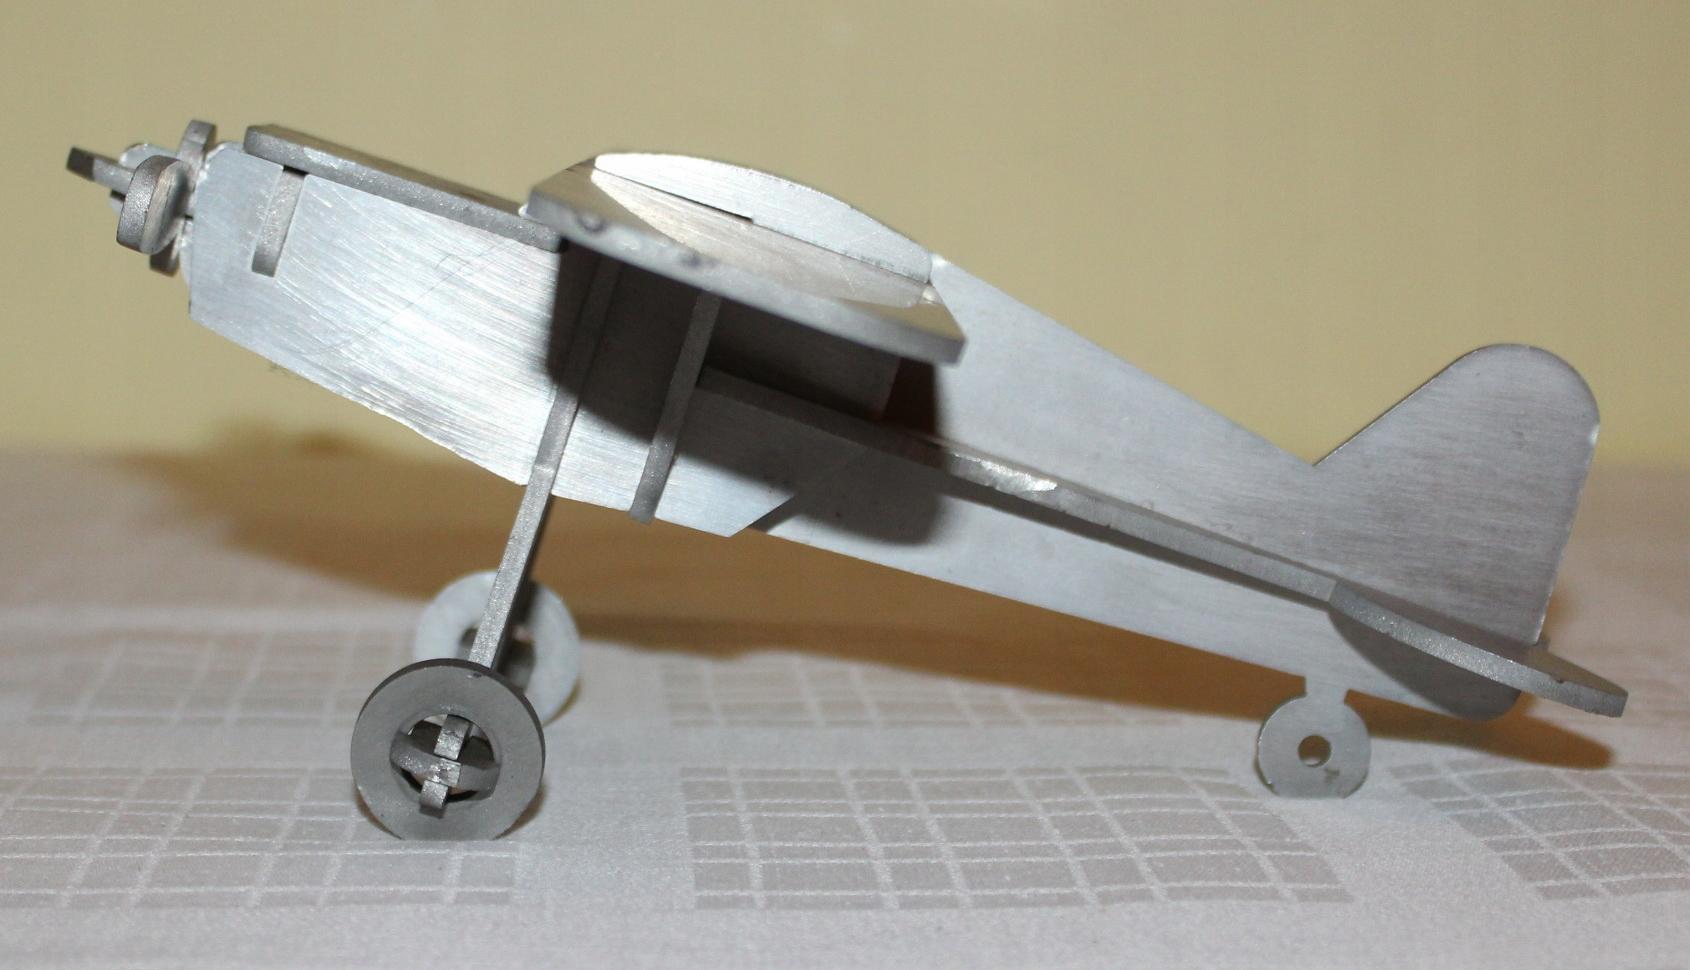 ANTEK samolot model metalowy